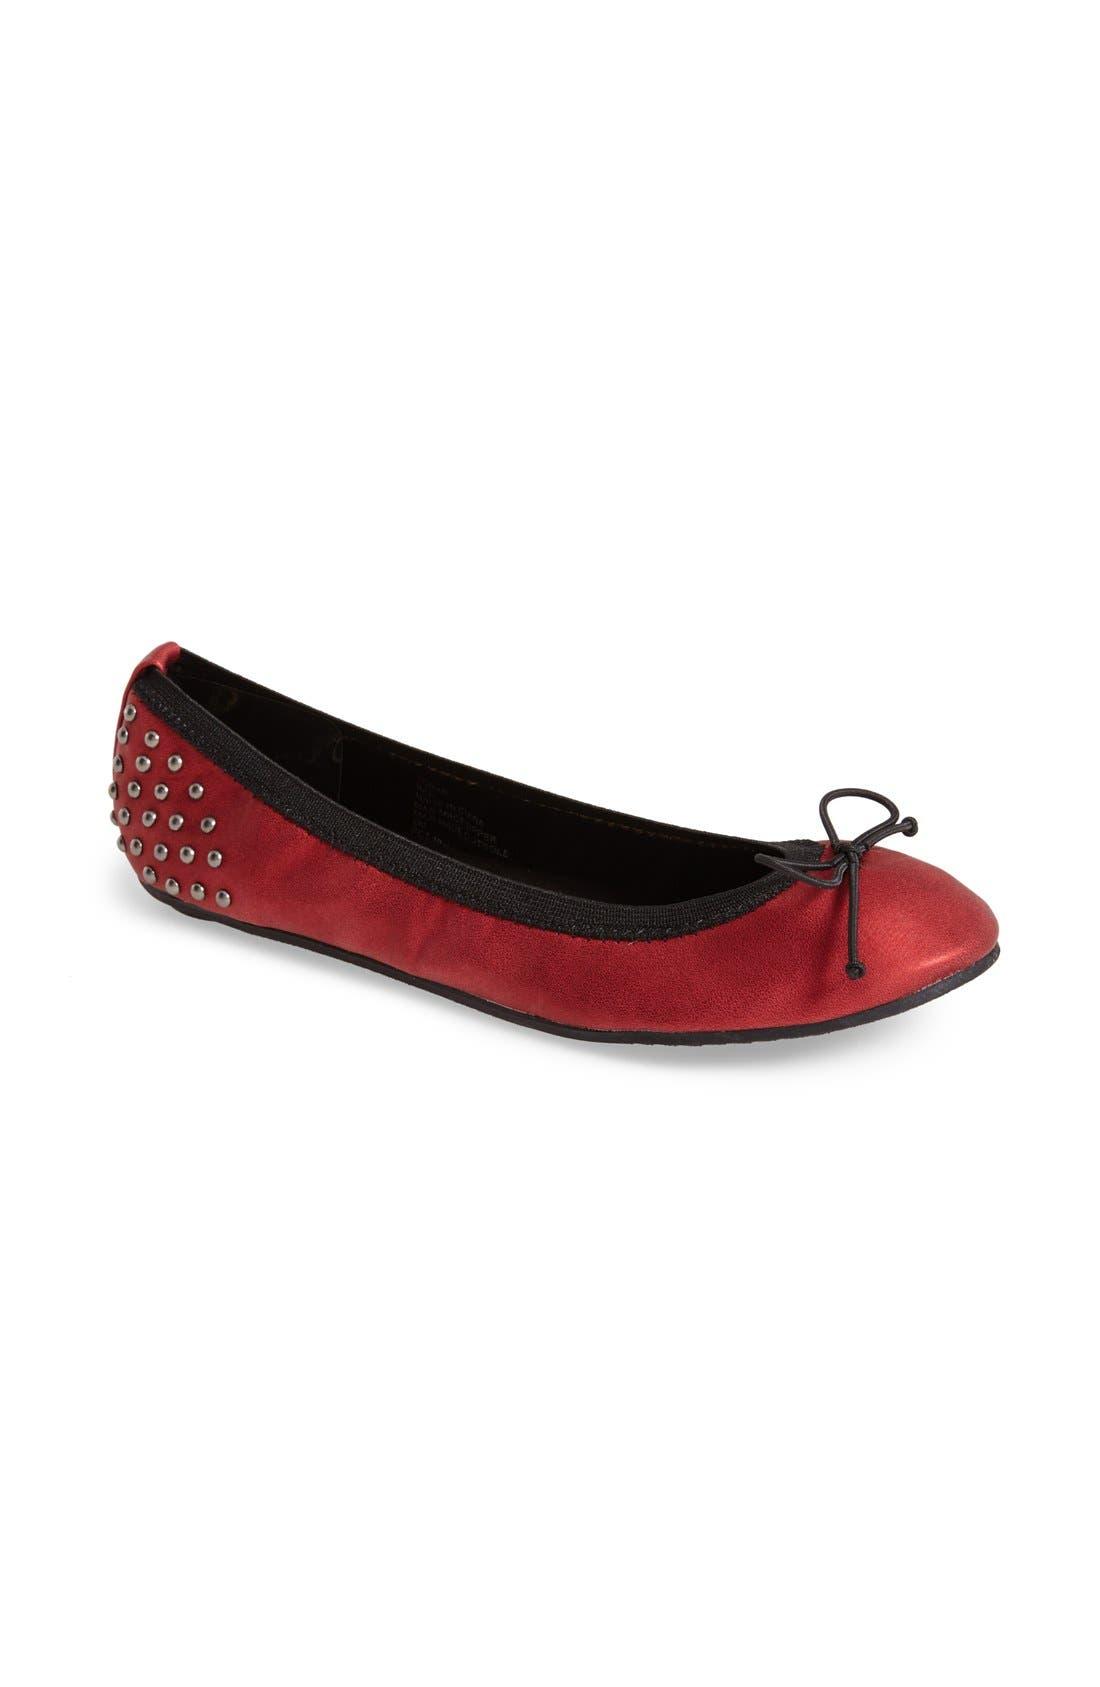 Main Image - Footzyfolds 'Tonya' Foldable Ballet Flat (Women)